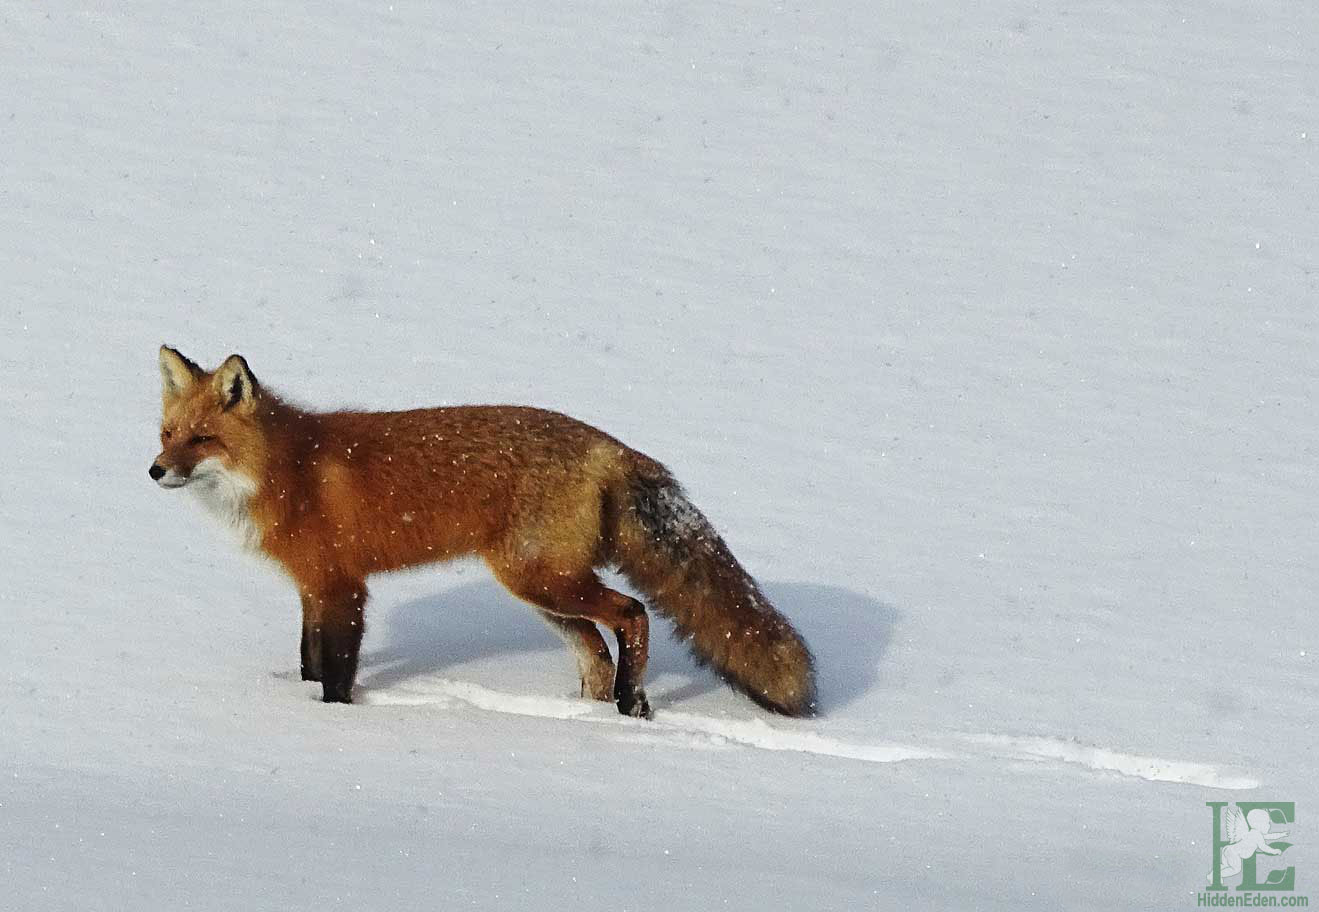 Winter in Muskoka – Red Fox in the Snow